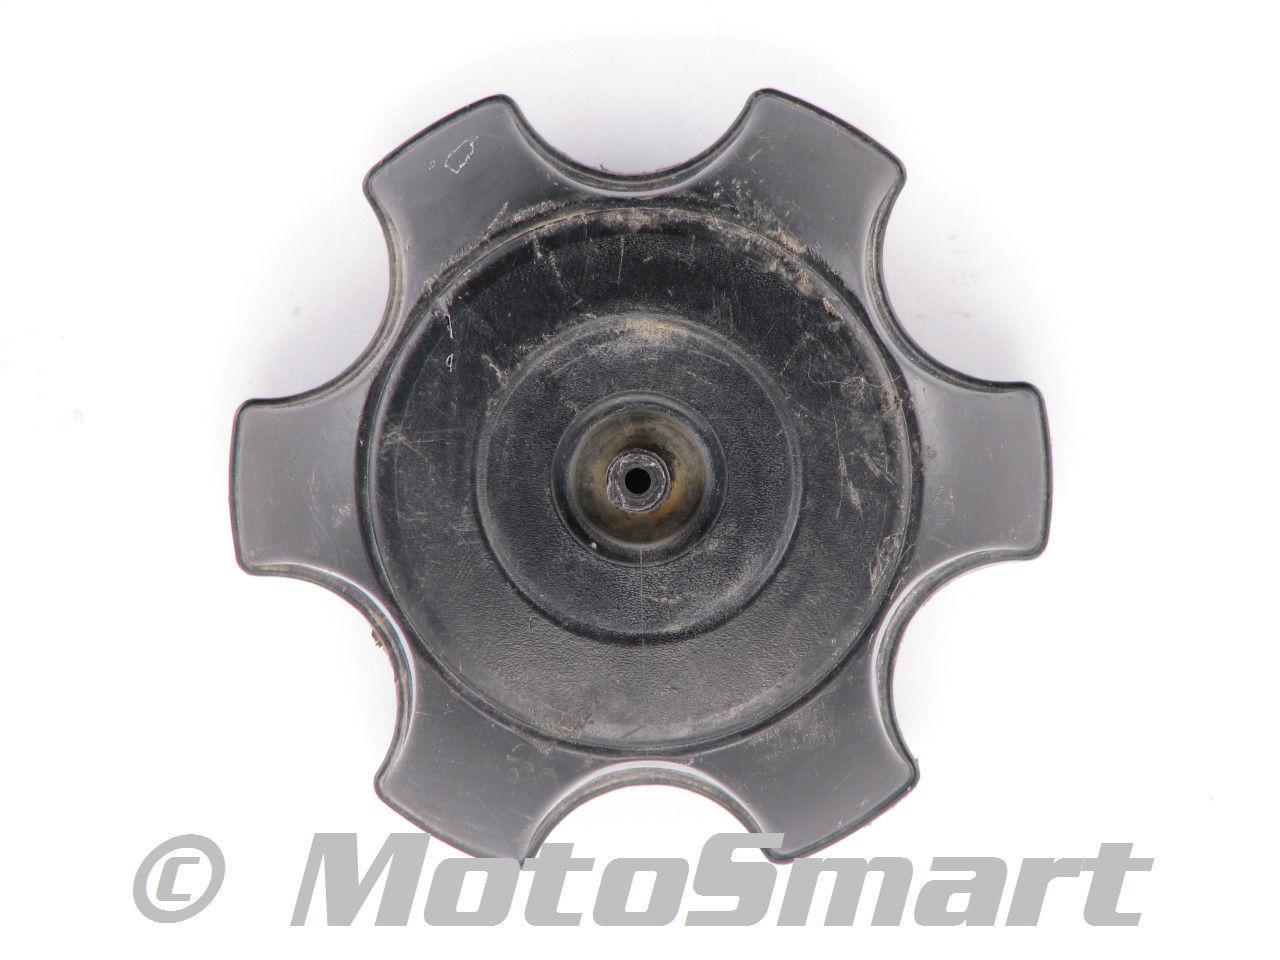 90-1990-Honda-CR500R-CR500-CR-500-R-Gas-Fuel-Tank-Cap-Good-Used-101002-280549050892-2